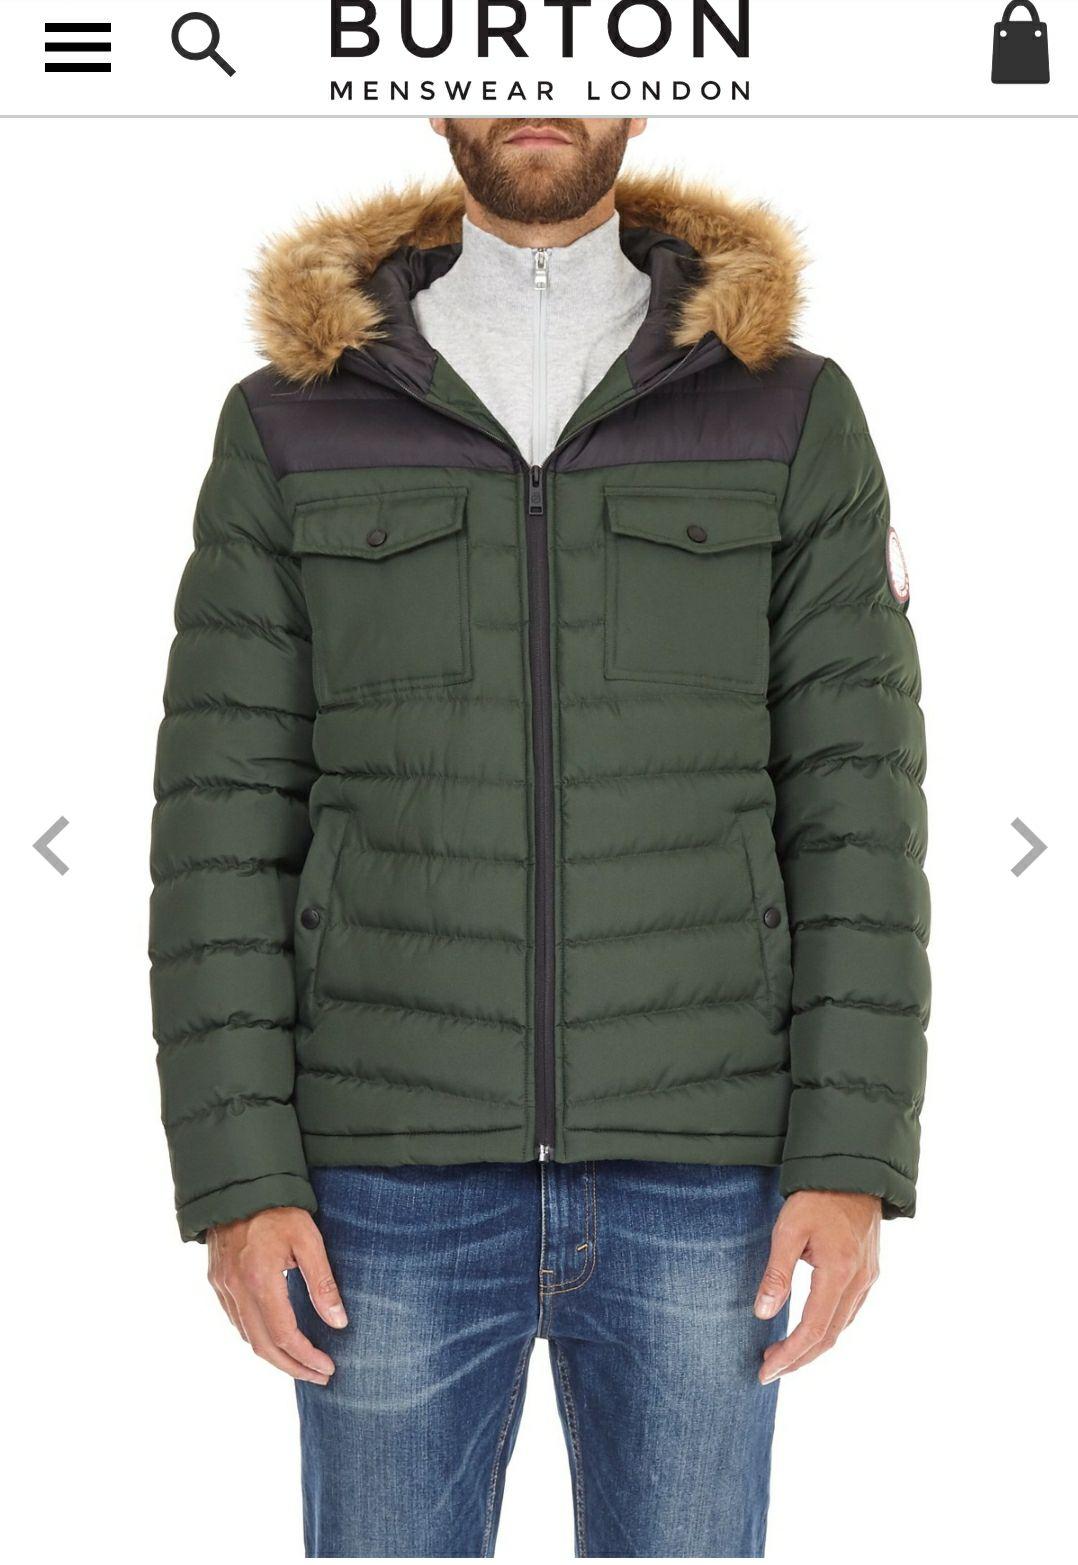 Two tone lightweight hooded Puffer jacket - £22.50 @ Burton